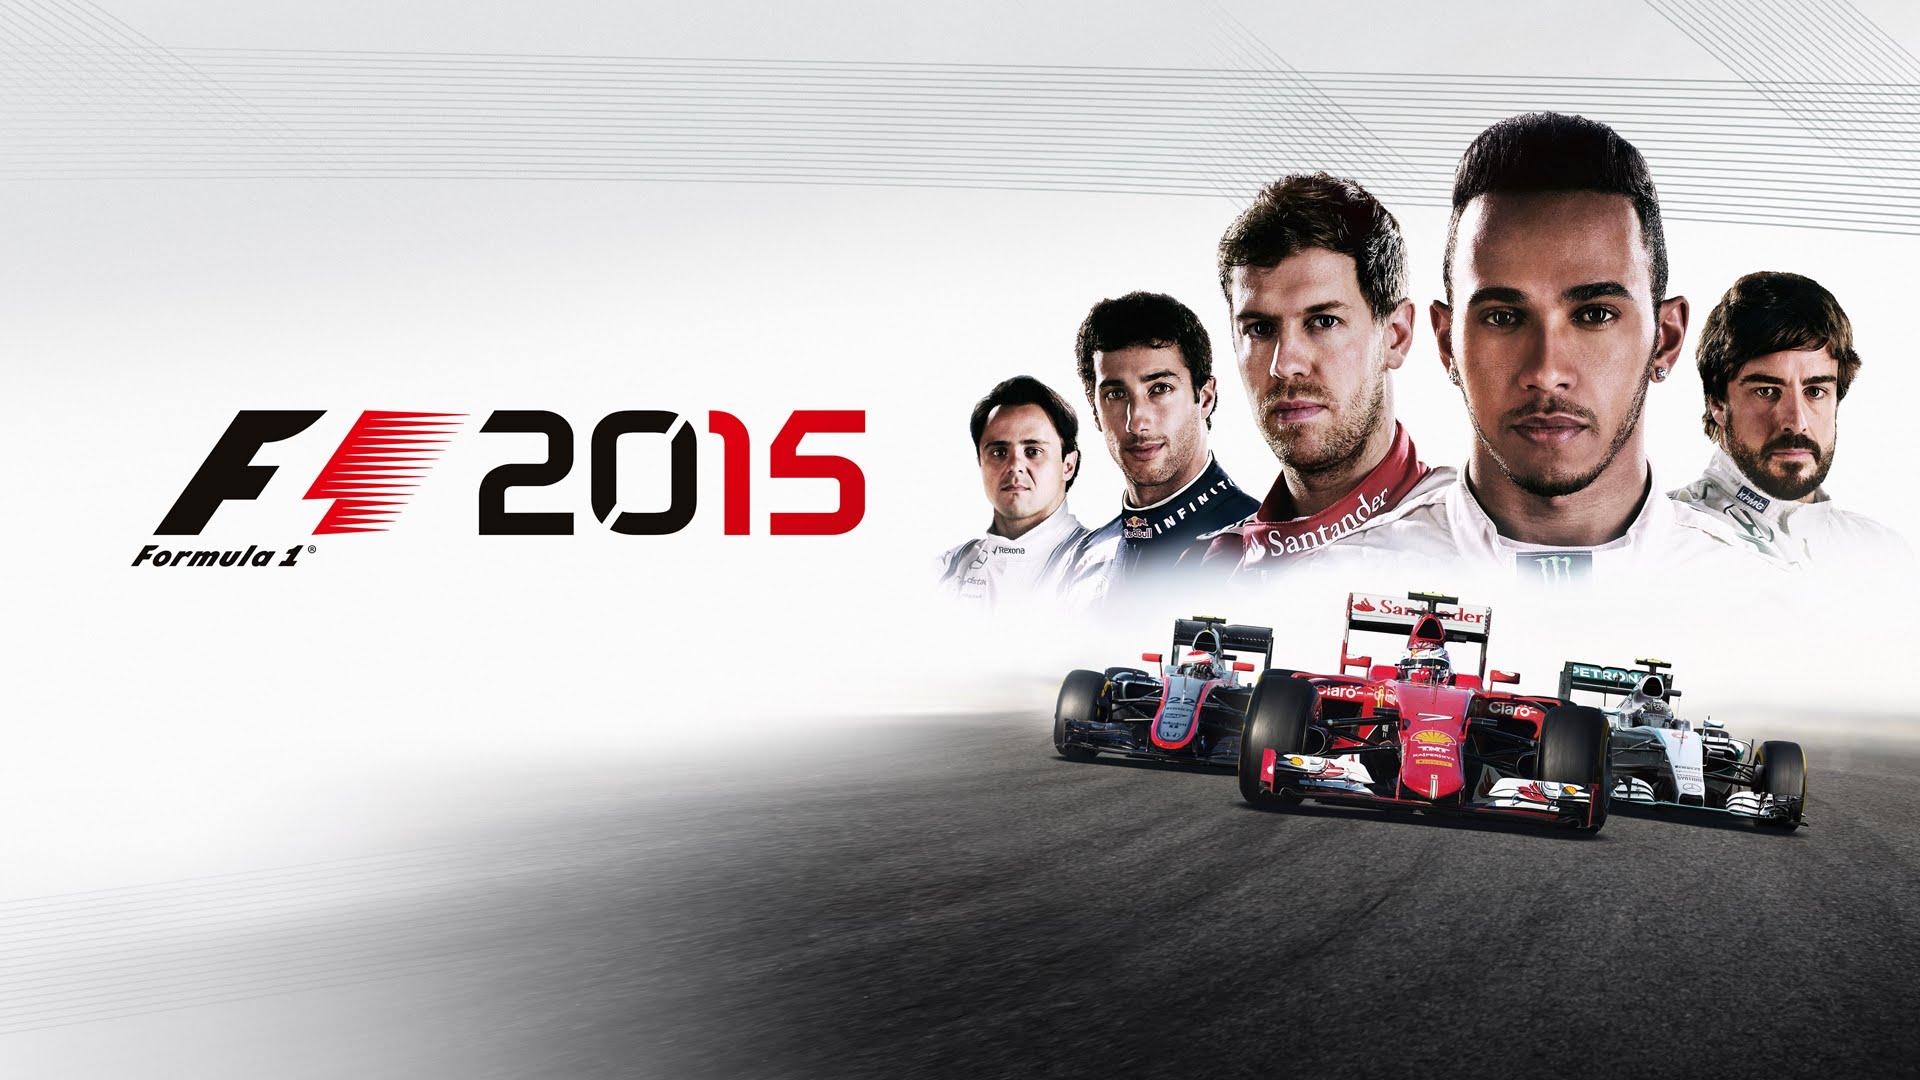 F1_2015__cover1920x1080.jpg